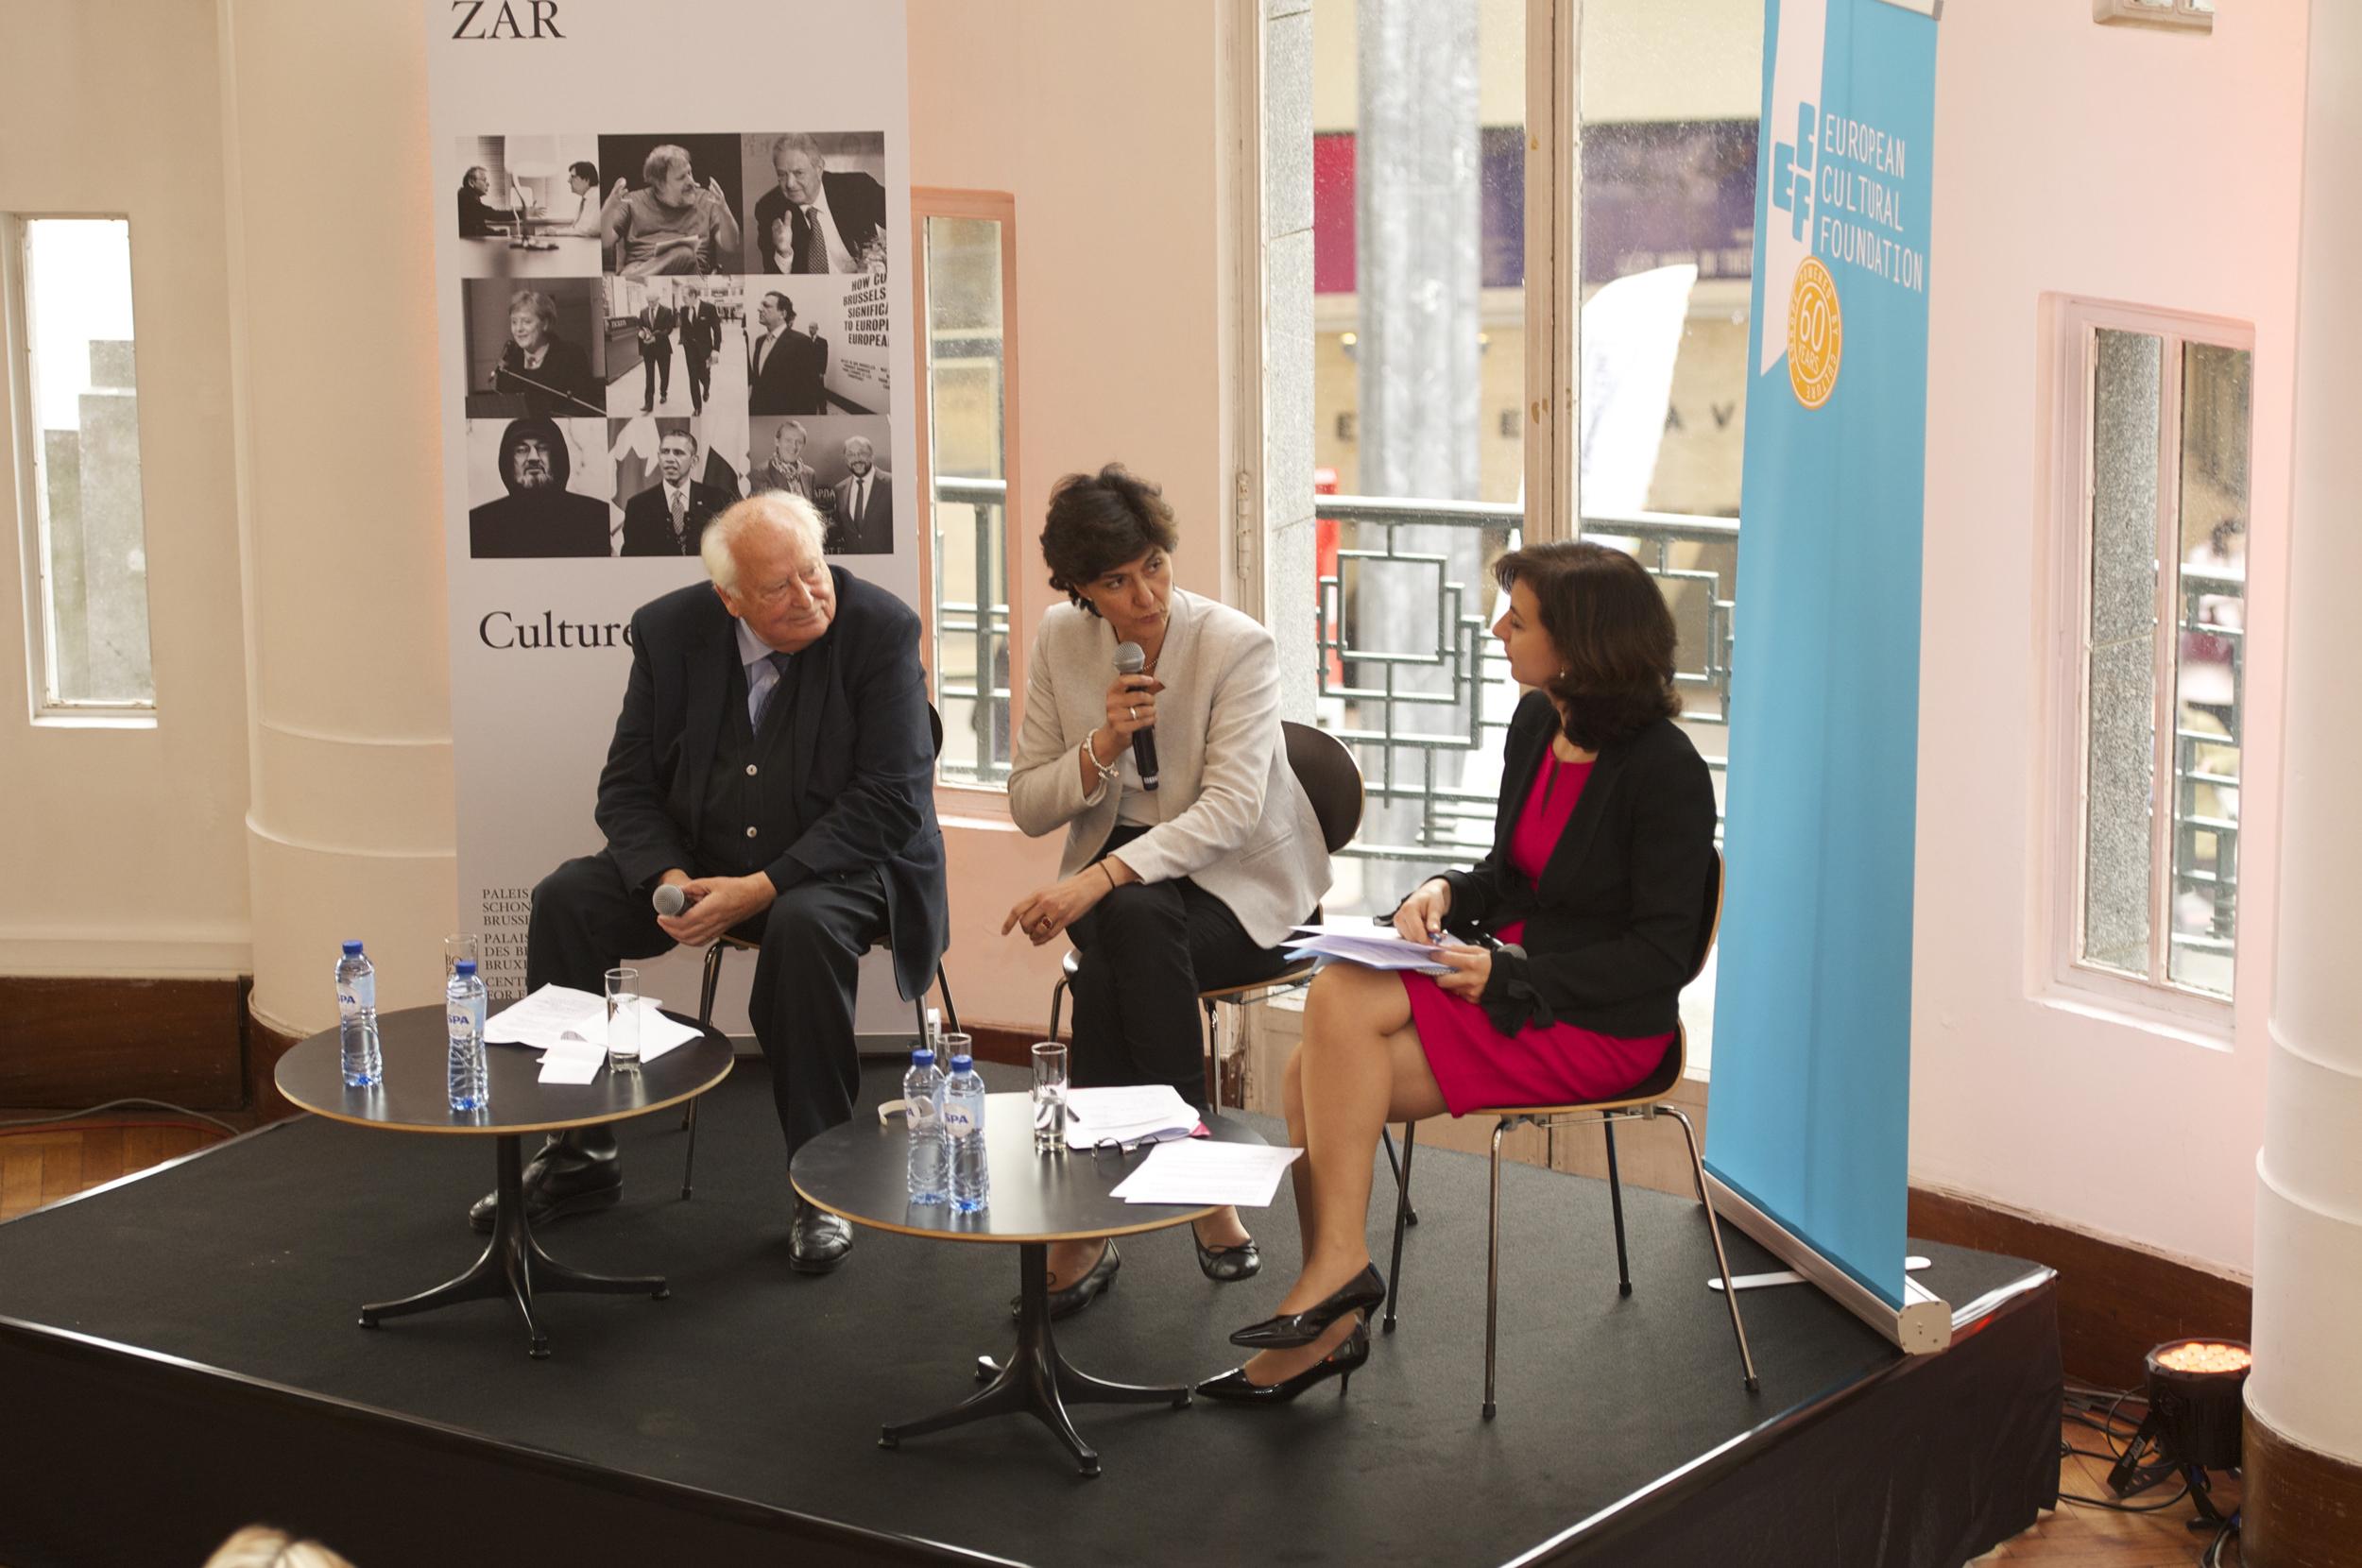 Raymond Georis, Sylvie Goulard and Vanessa Mock at the Historic Speech debate at BOZAR.Photo ©Yves Gervais